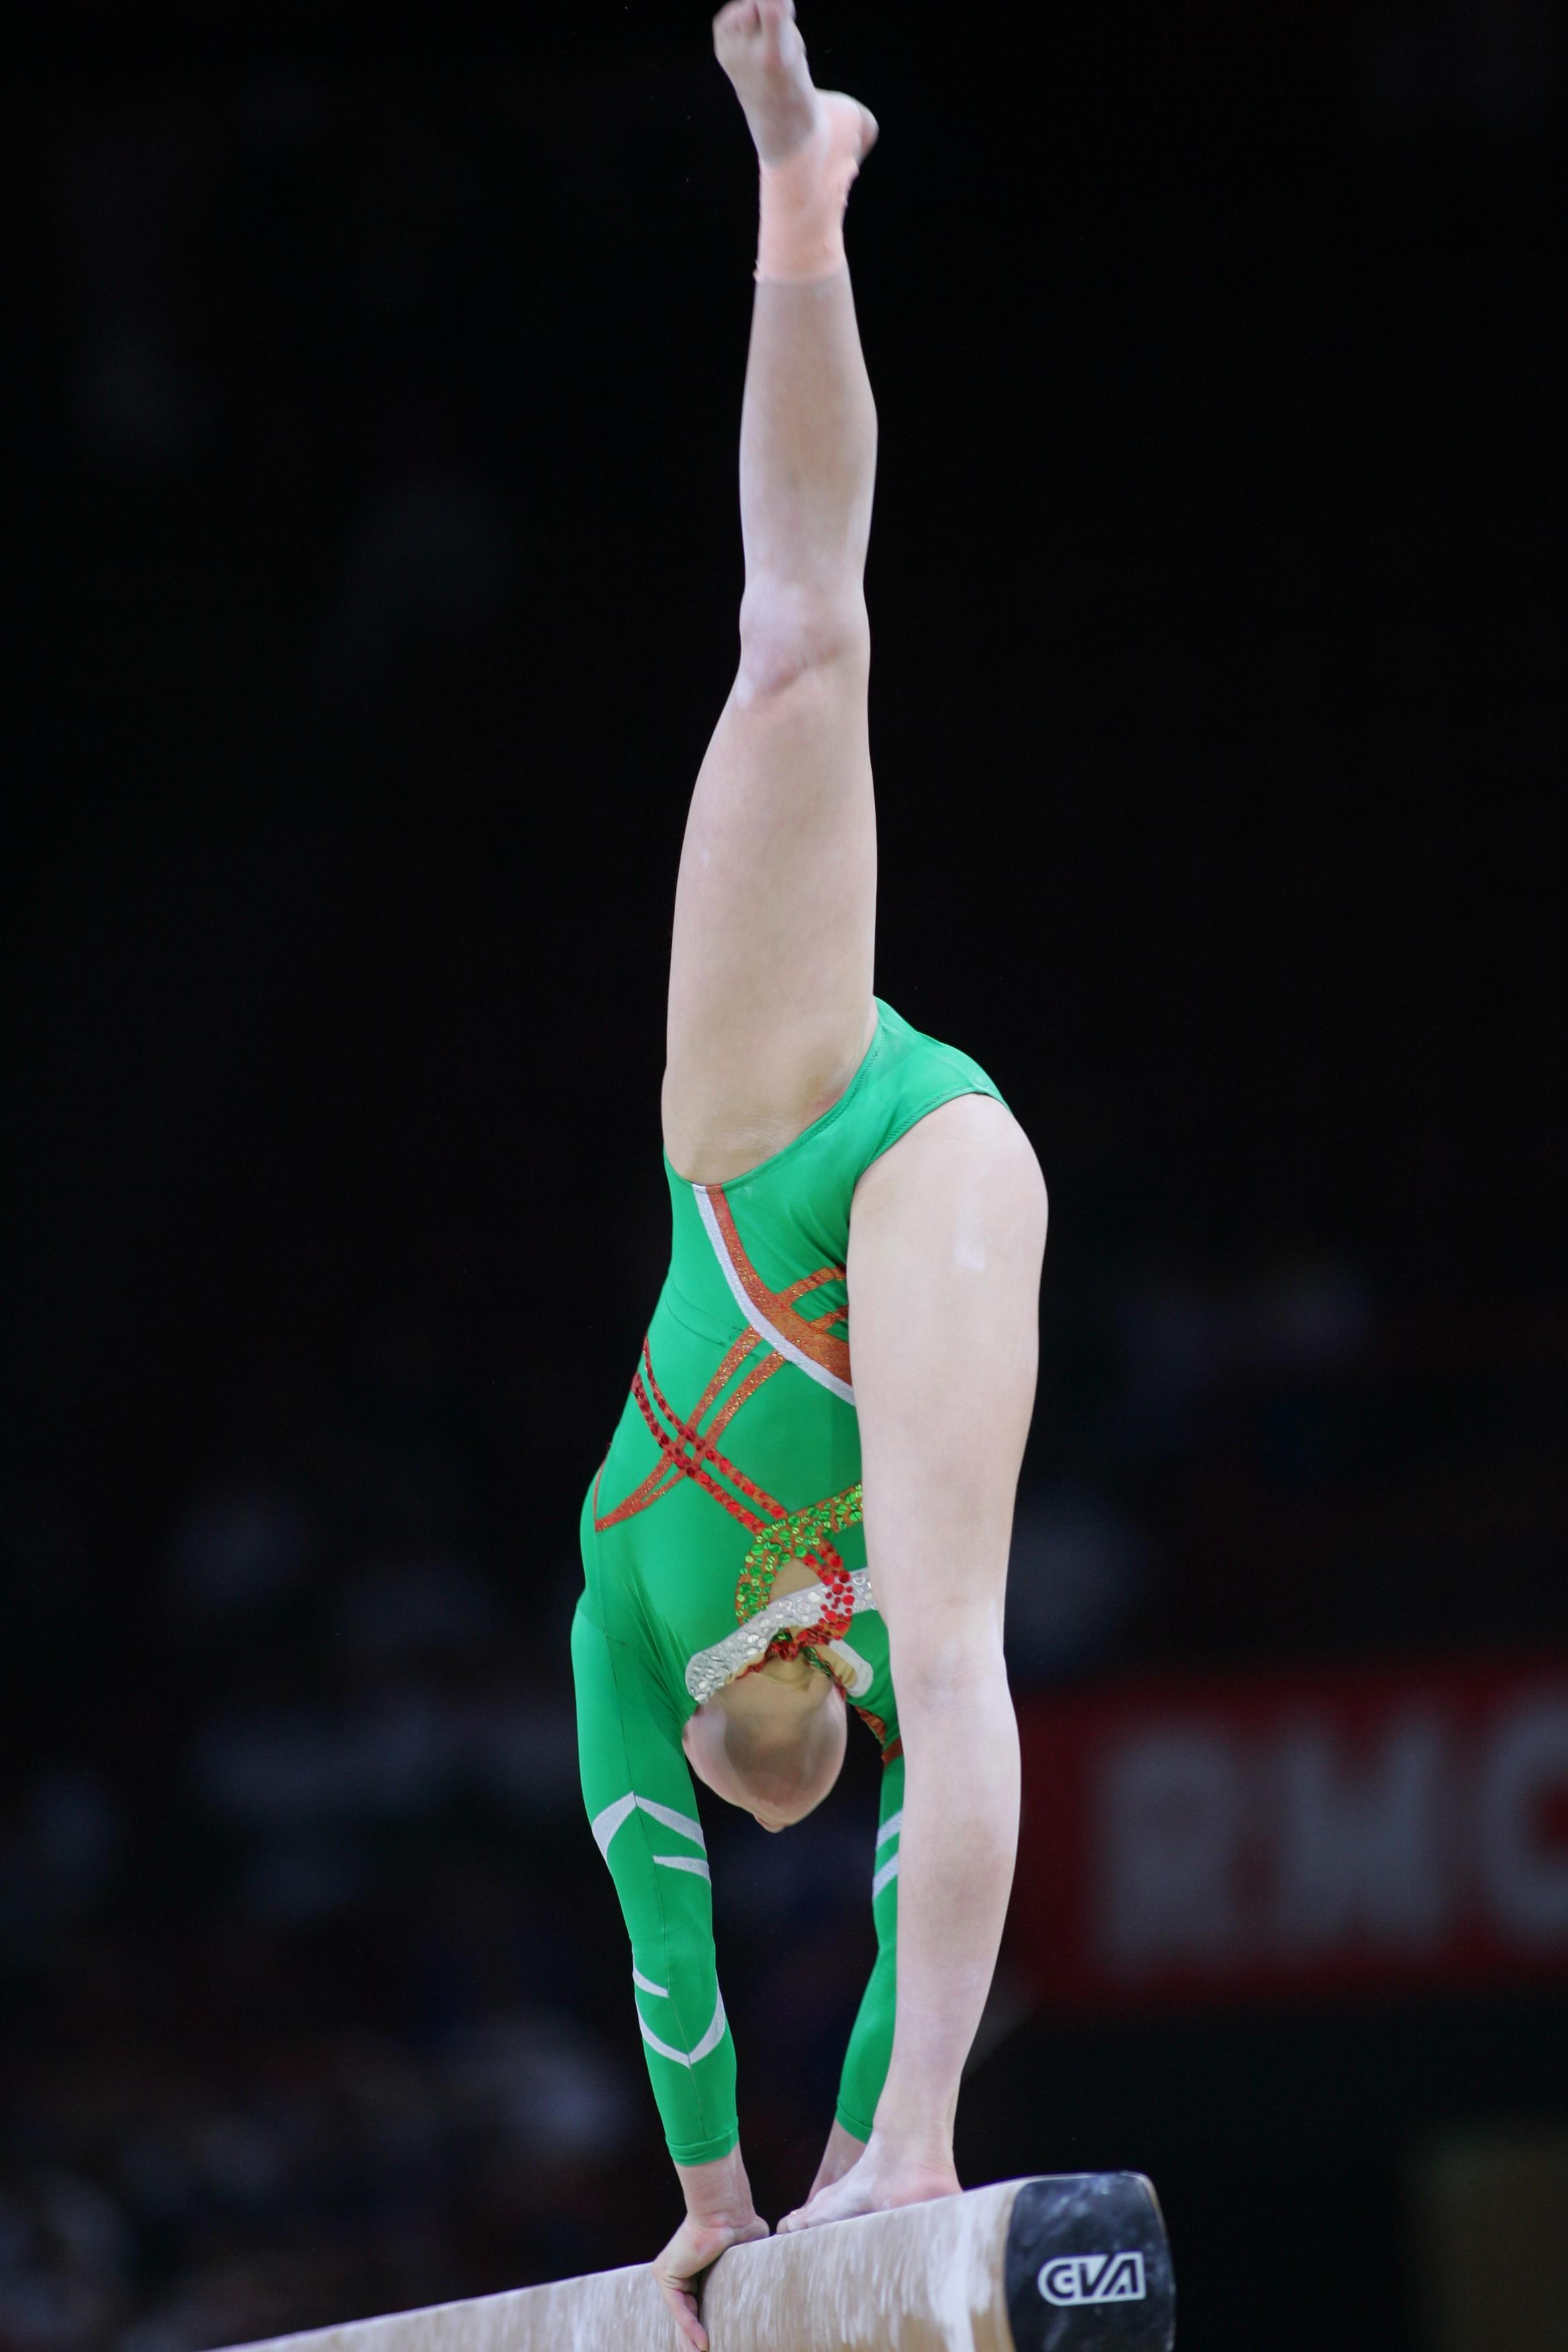 gymnast cameltoe tumblr